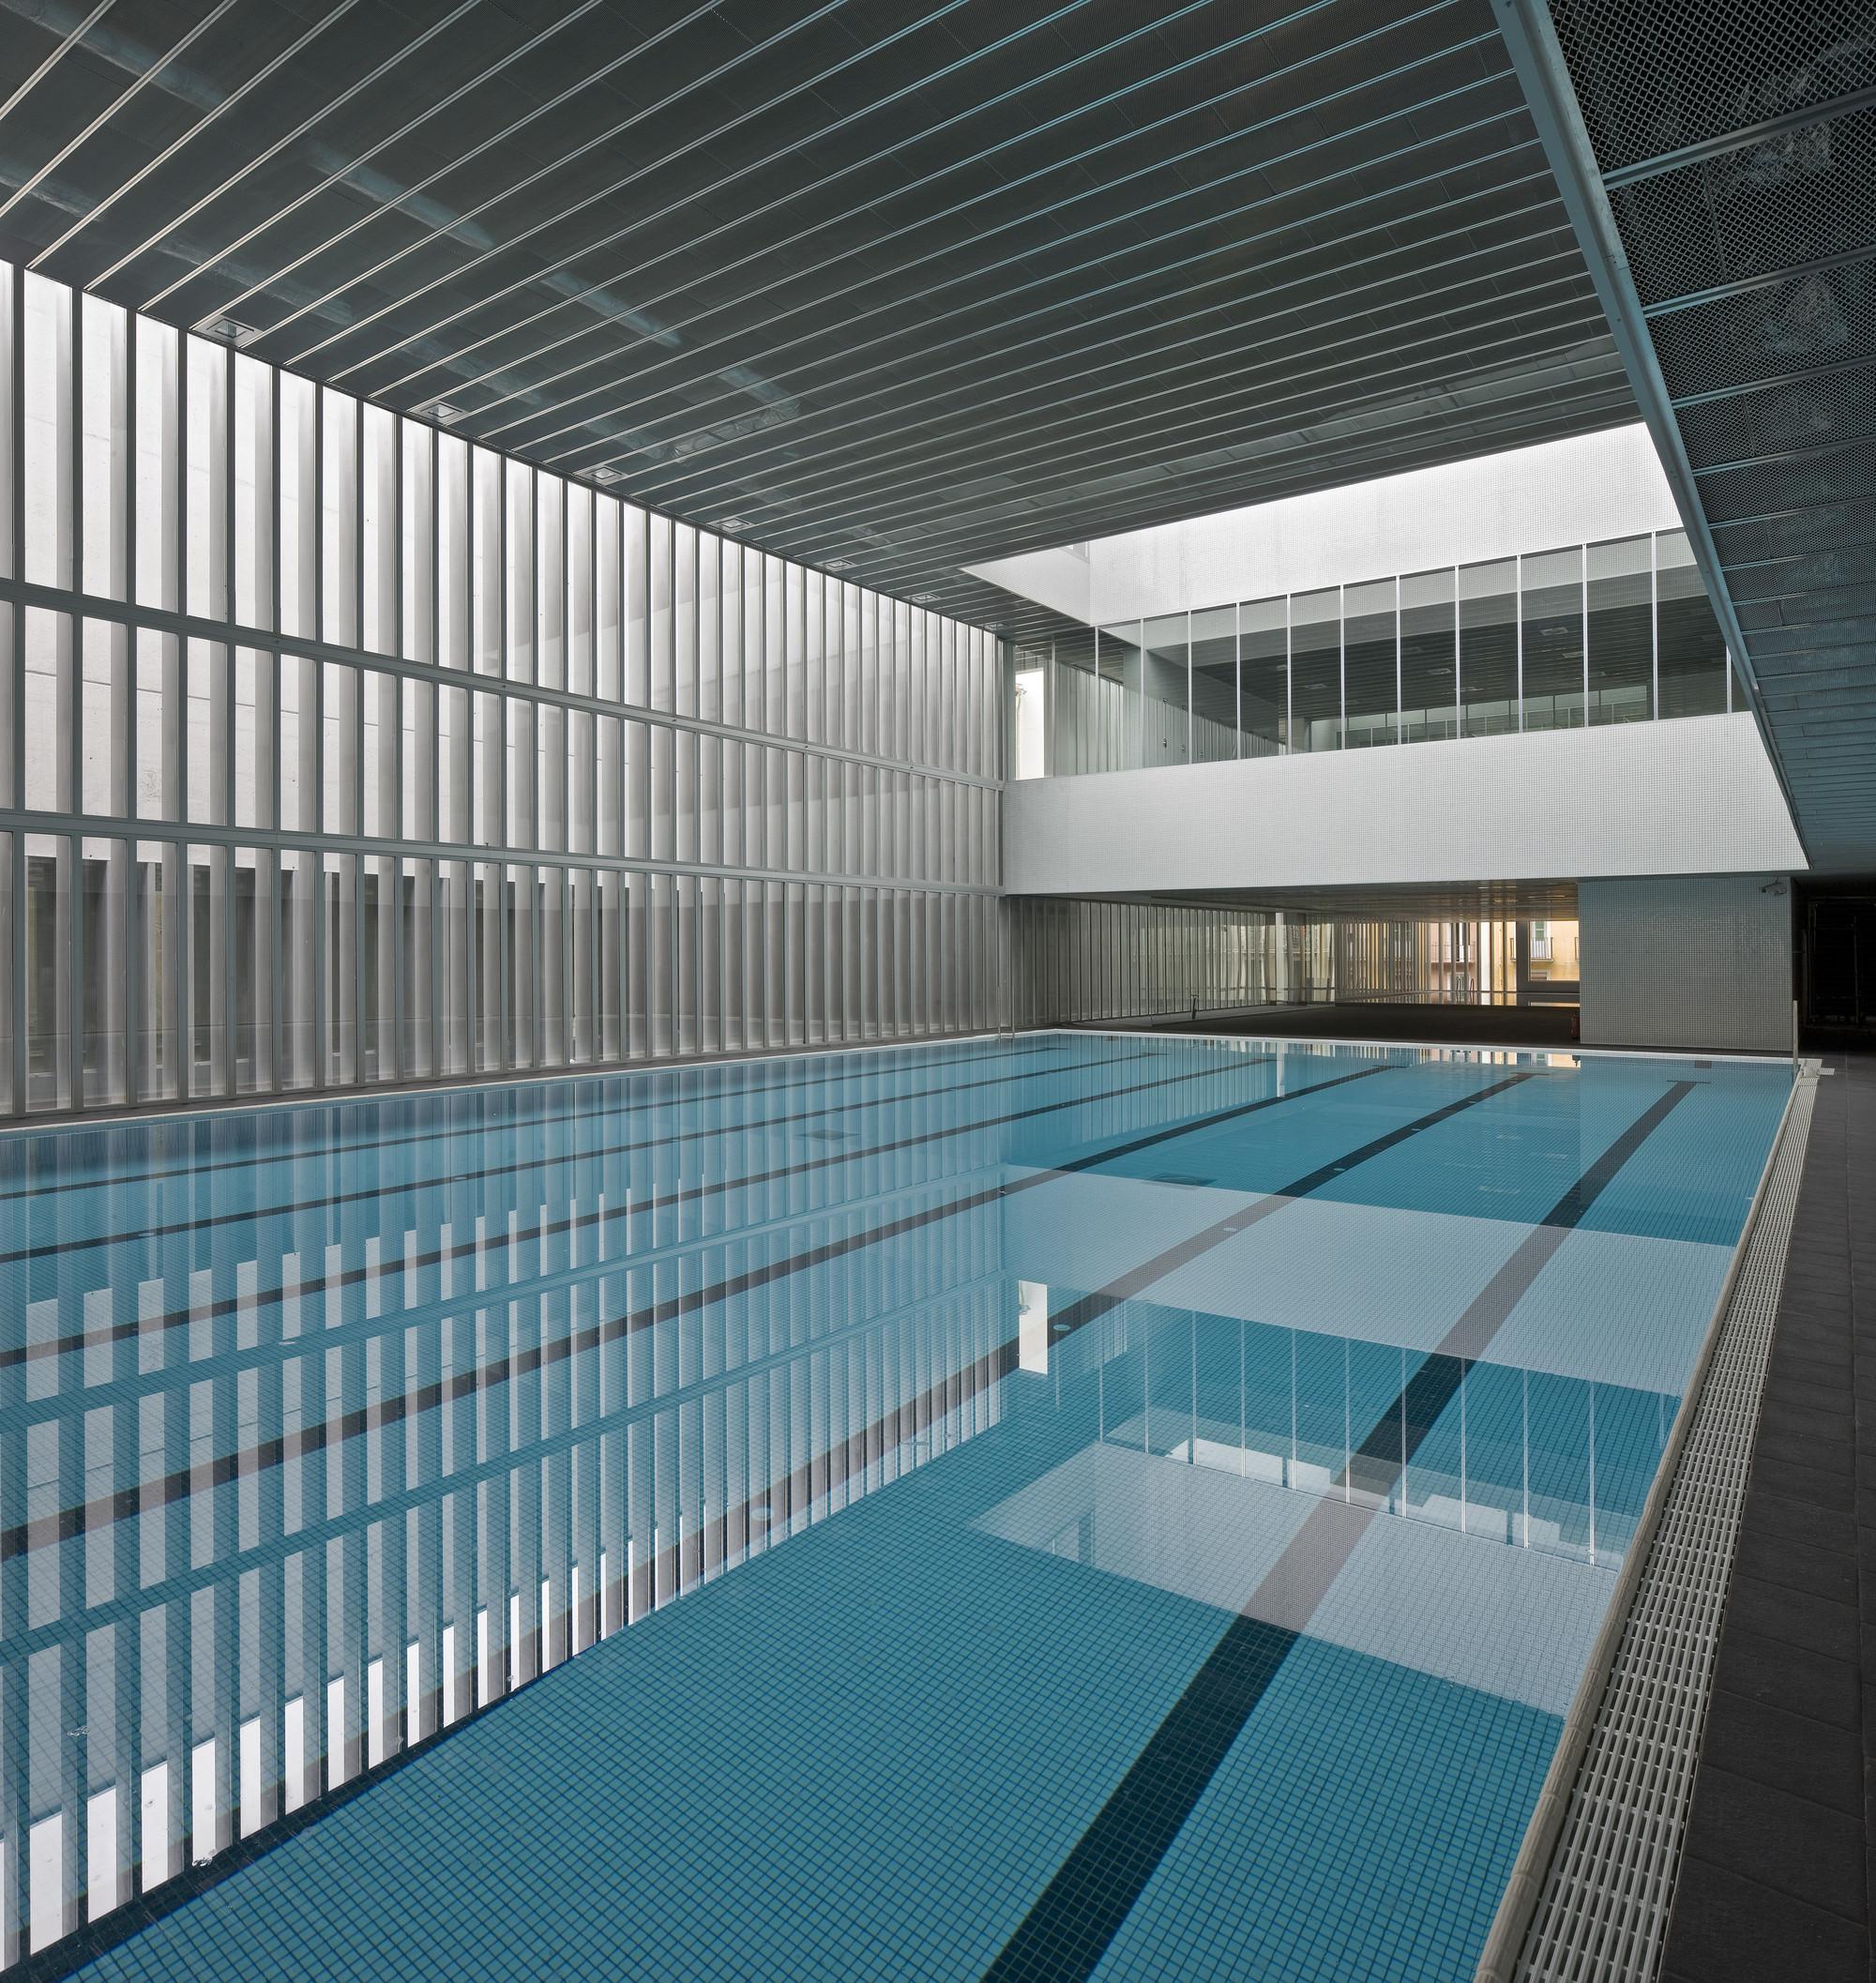 Hydrothermal Center 'Aquavox' / Otxotorena